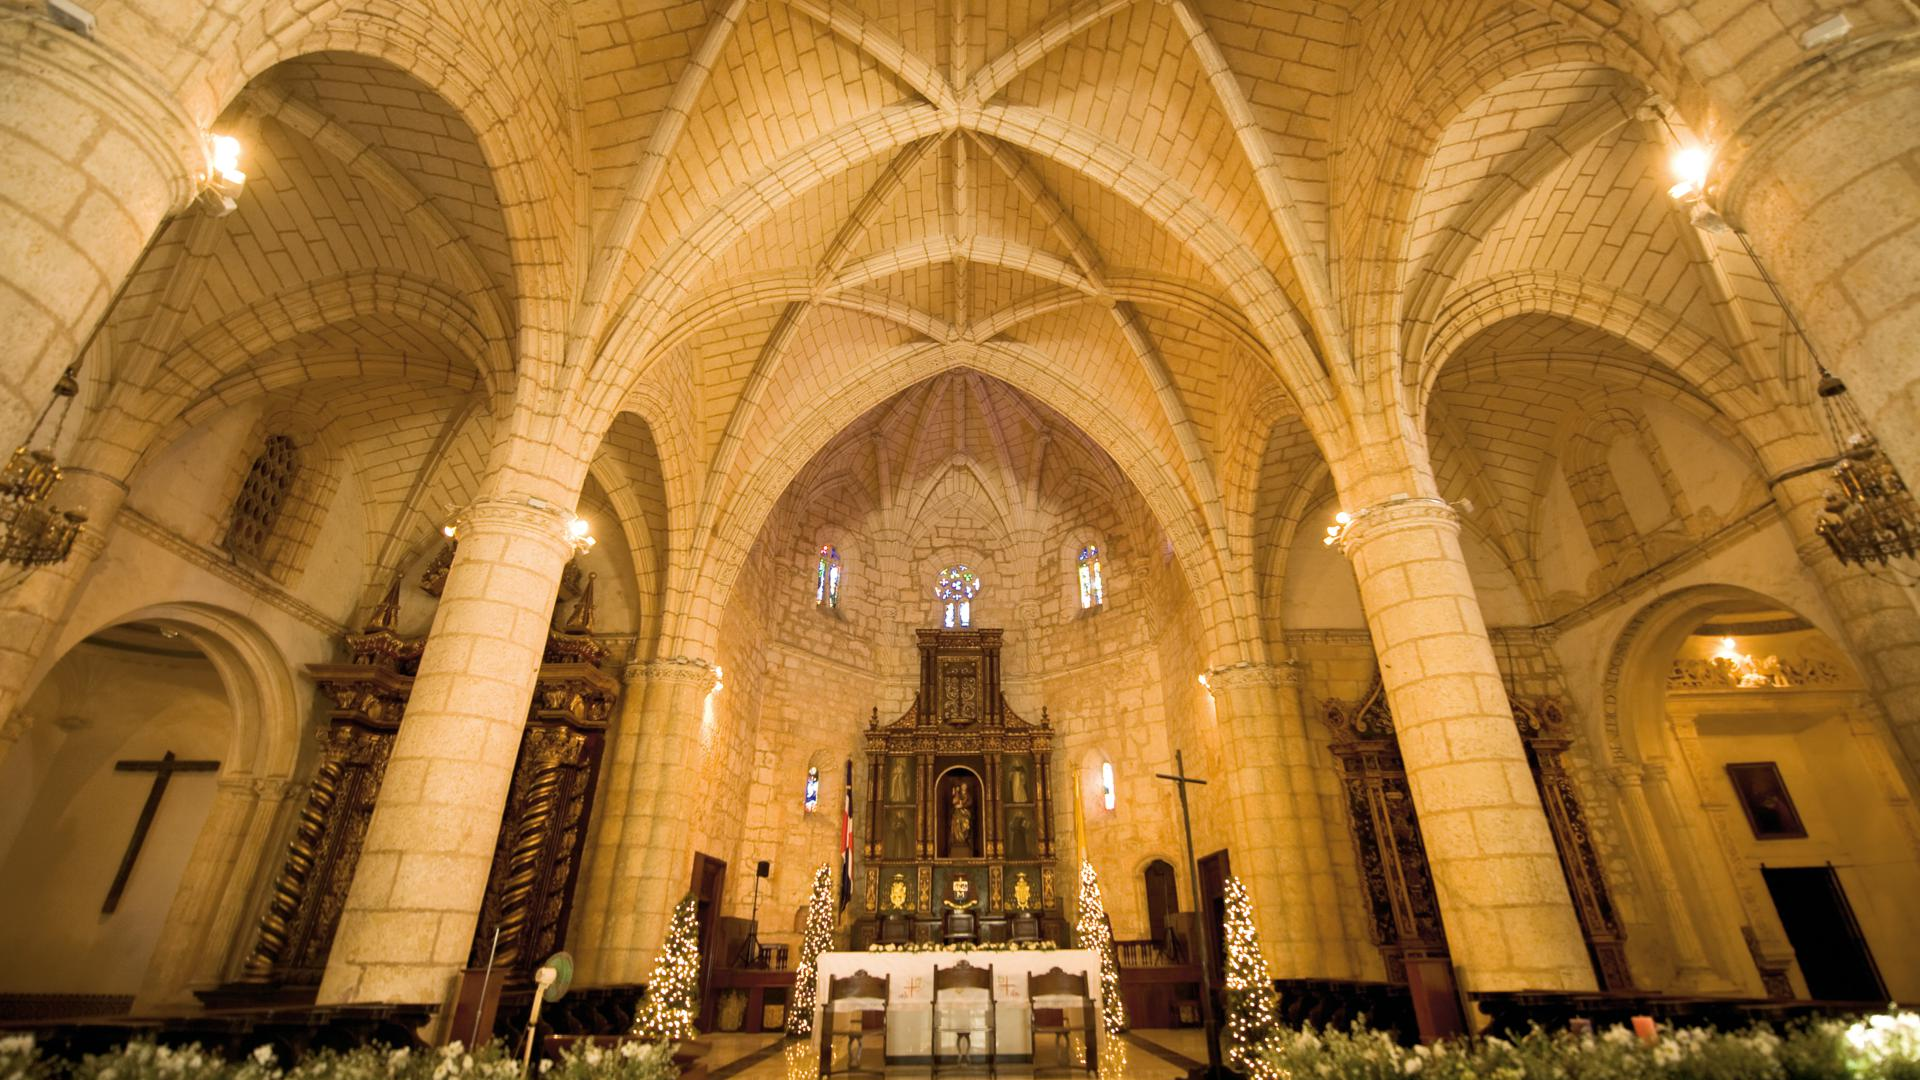 dominican_republic_travel_119_santo_domingo_cathedral_zona_colonial_1920